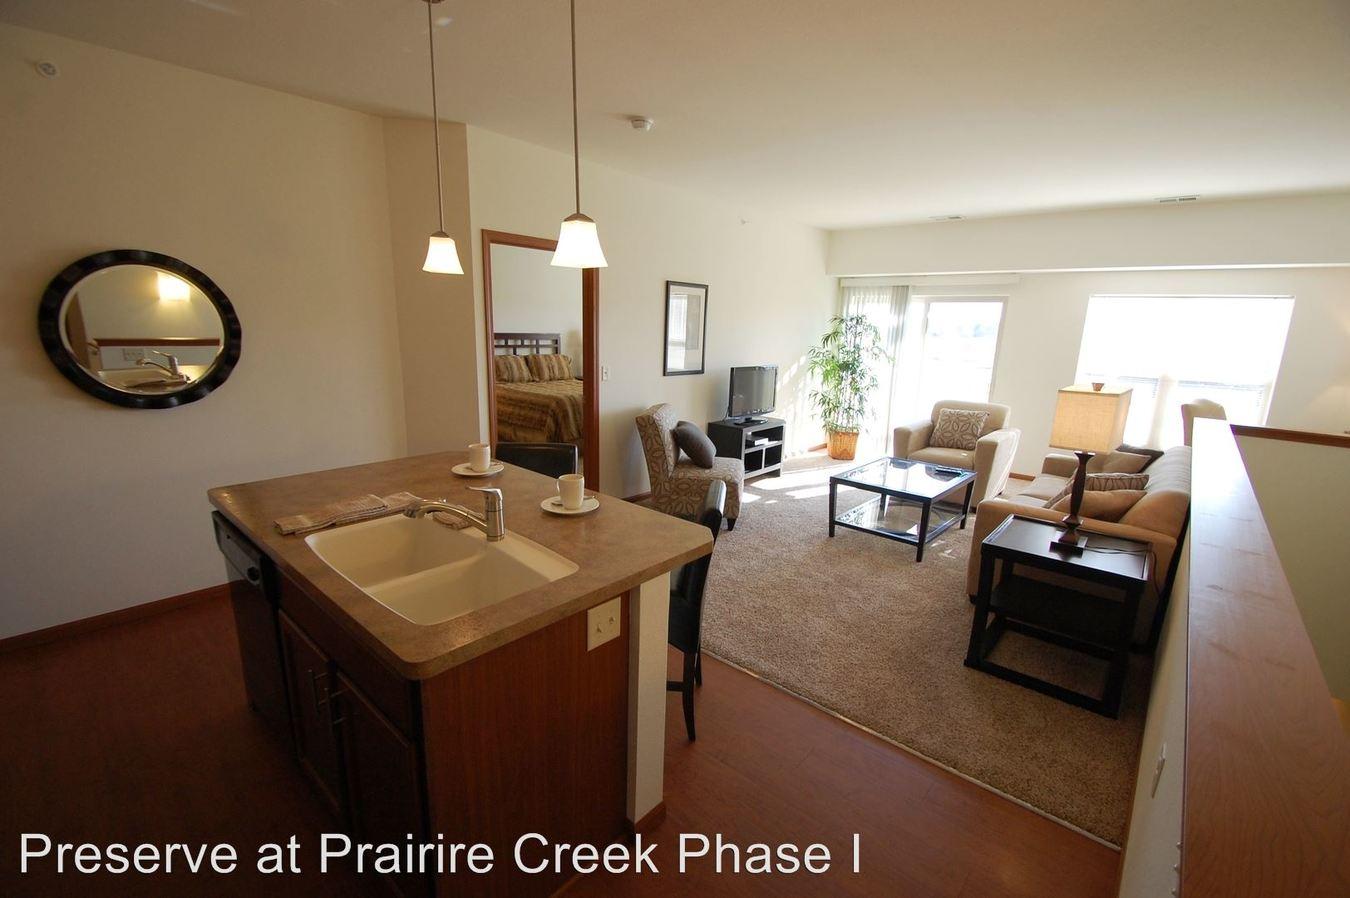 Studio 1 Bathroom Apartment for rent at 1225 Prairie Creek Blvd in Oconomowoc, WI